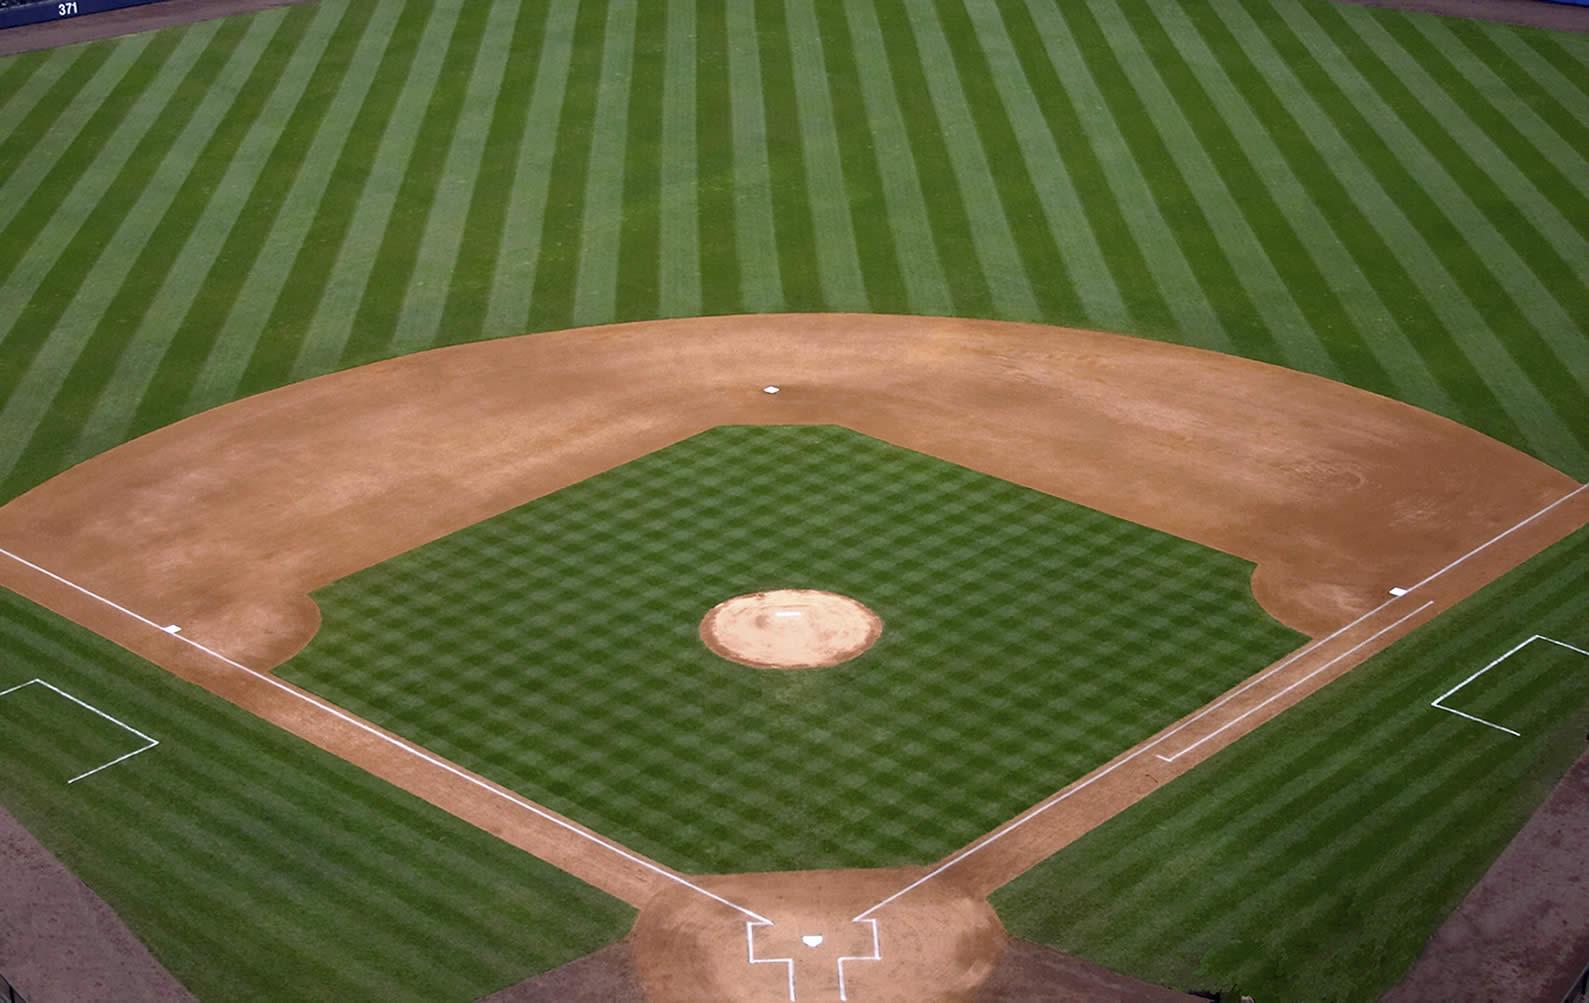 Diamond clipart softball diamond Art keywords Baseball baseball diamond